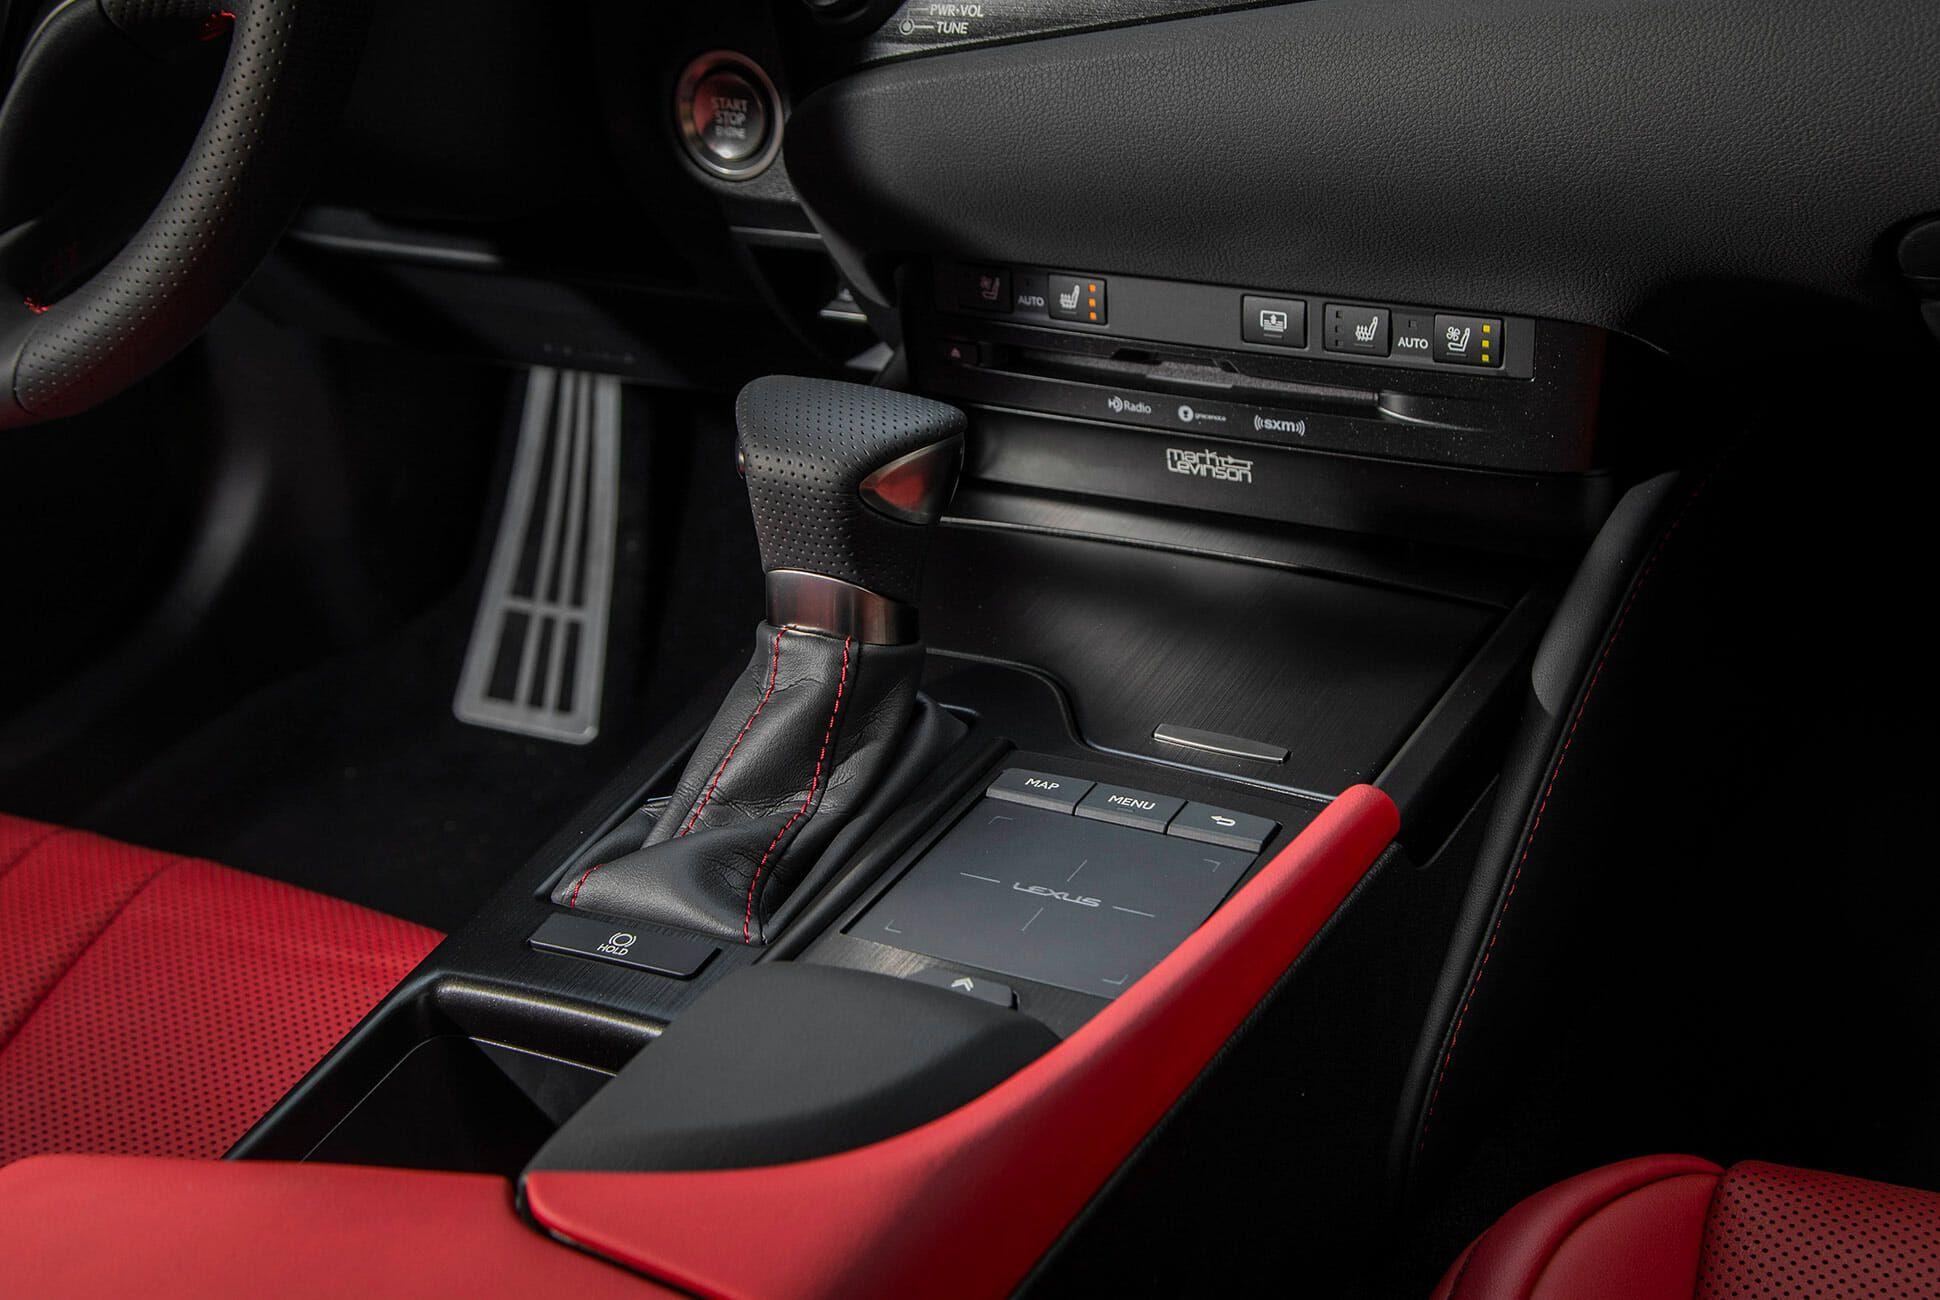 2019-Lexus-ES-350-F-Sport-Review-gear-patrol-slide-12